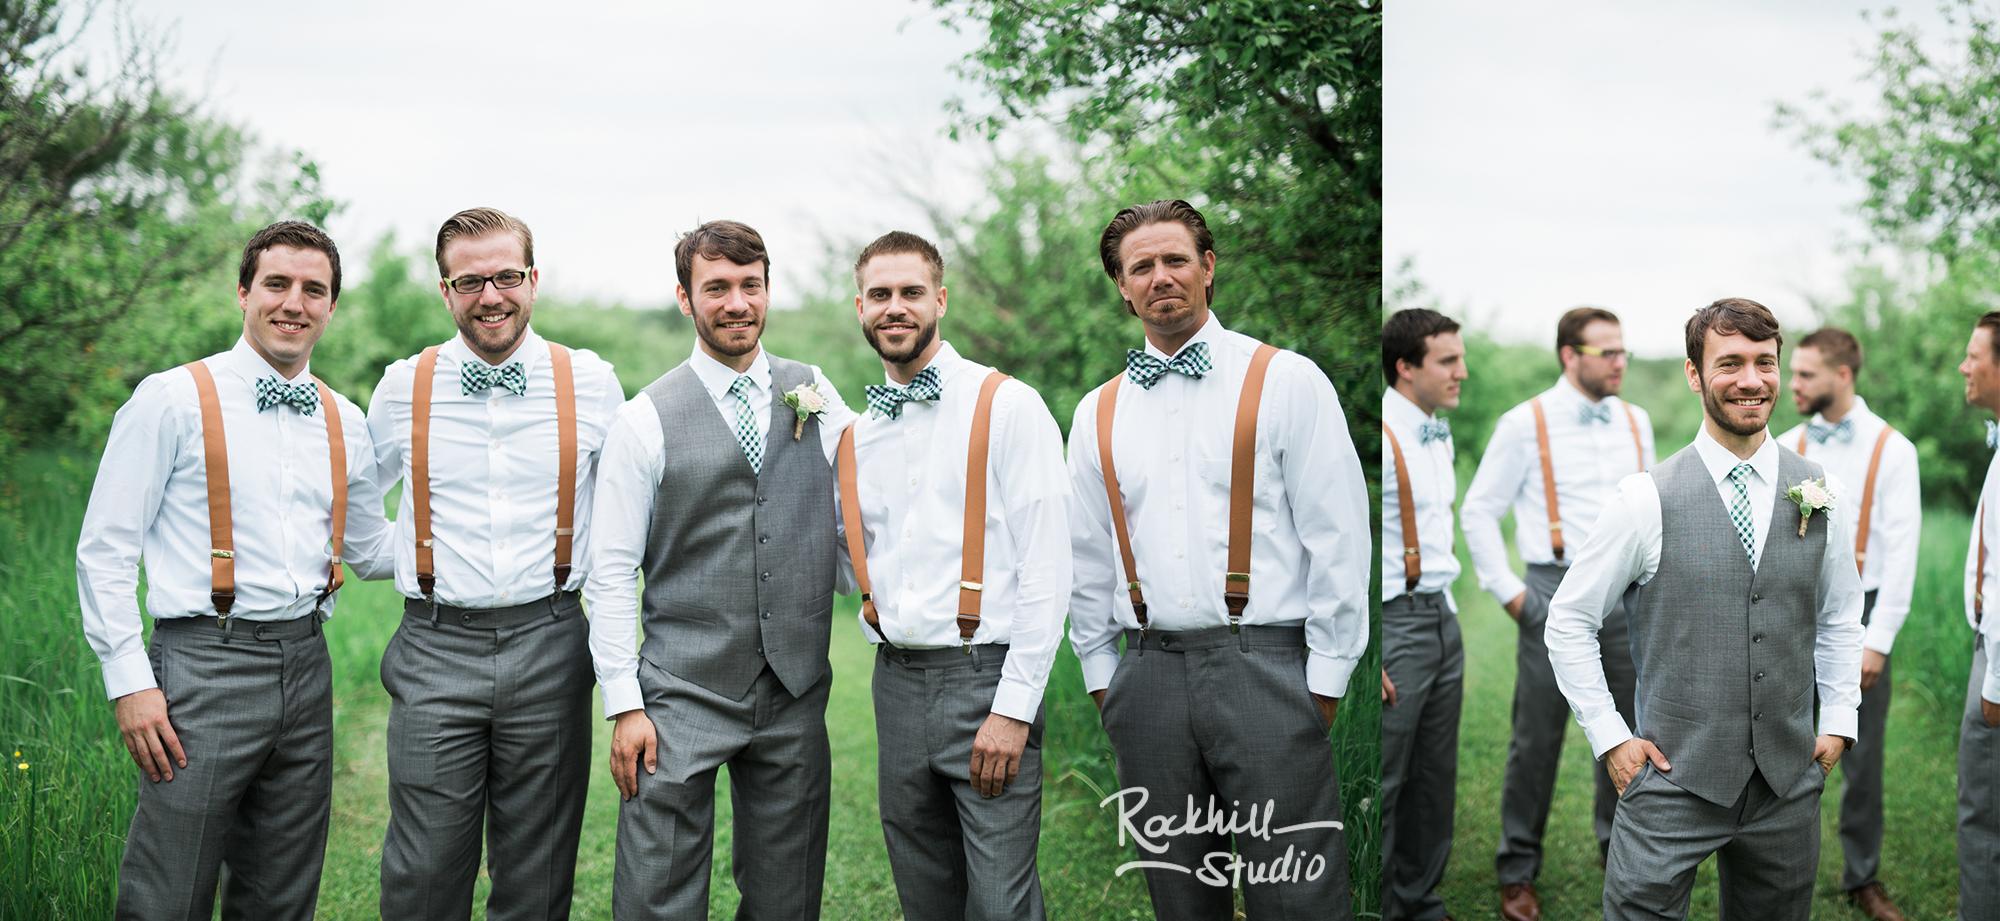 marquette-michigan-wedding-upper-peninsula-spring-photography-rockhill-ee-41.jpg